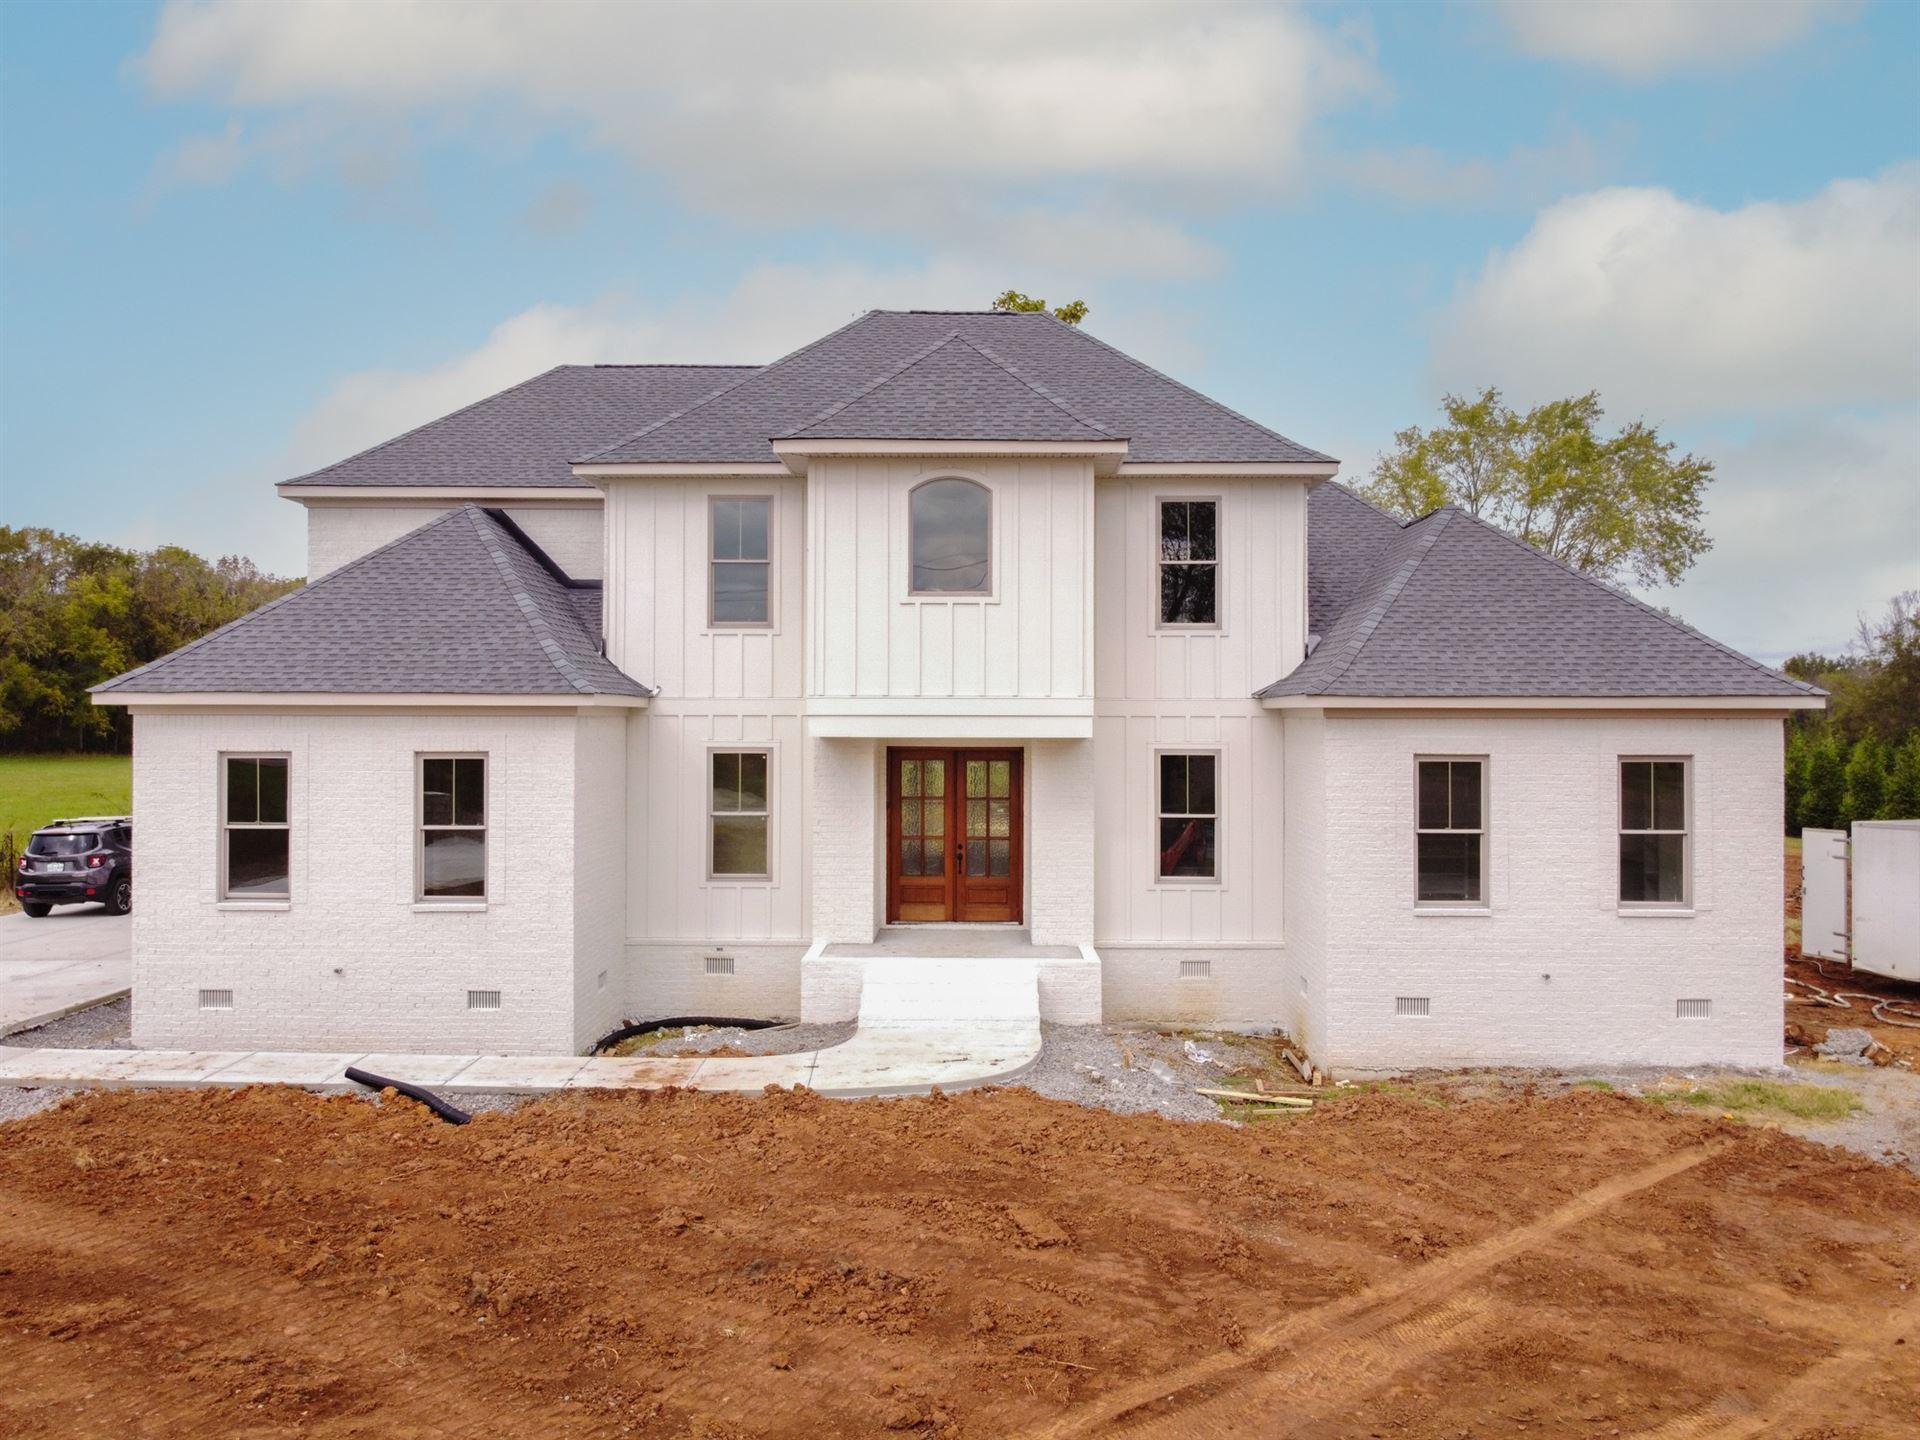 2070 Swamp Leanna Rd                                                                               Murfreesboro                                                                      , TN - $1,499,999